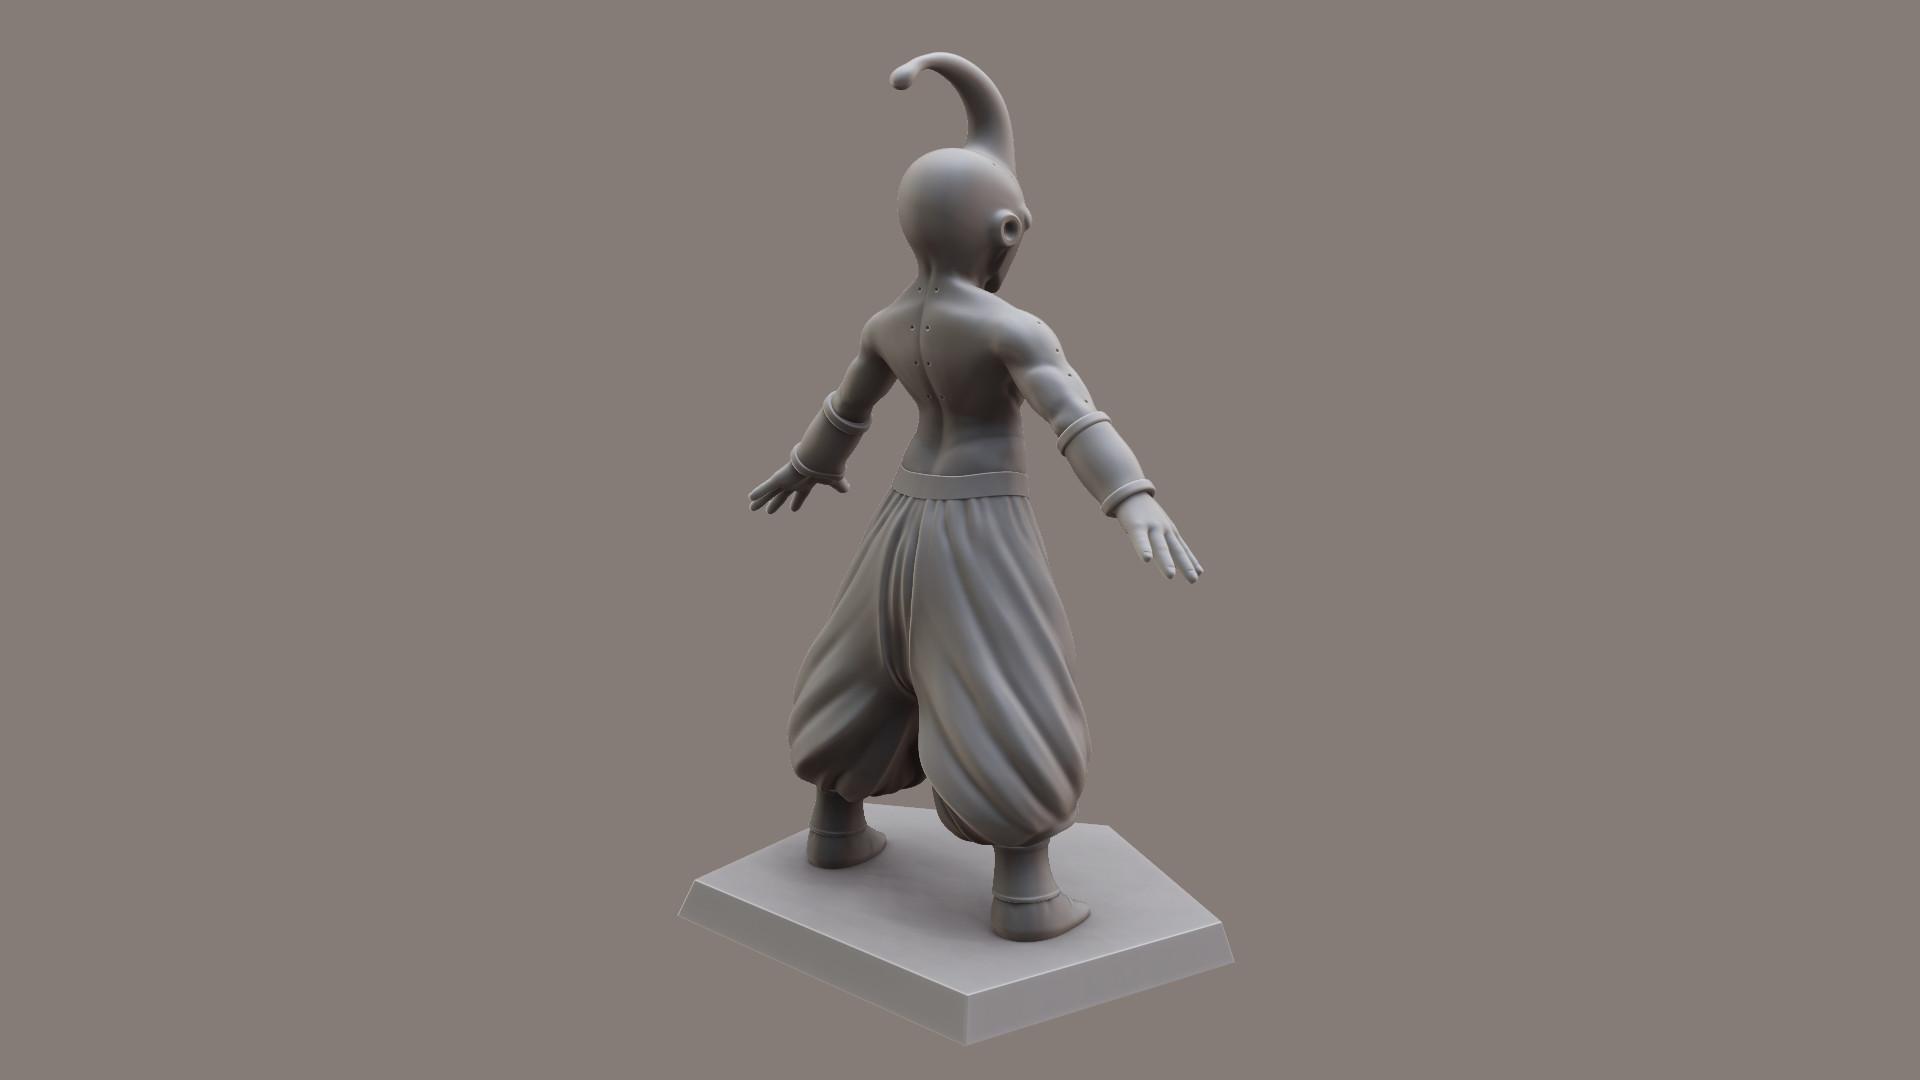 Benjamin makki kid buu sculpt benjamin makki buu render 03 altavistaventures Image collections